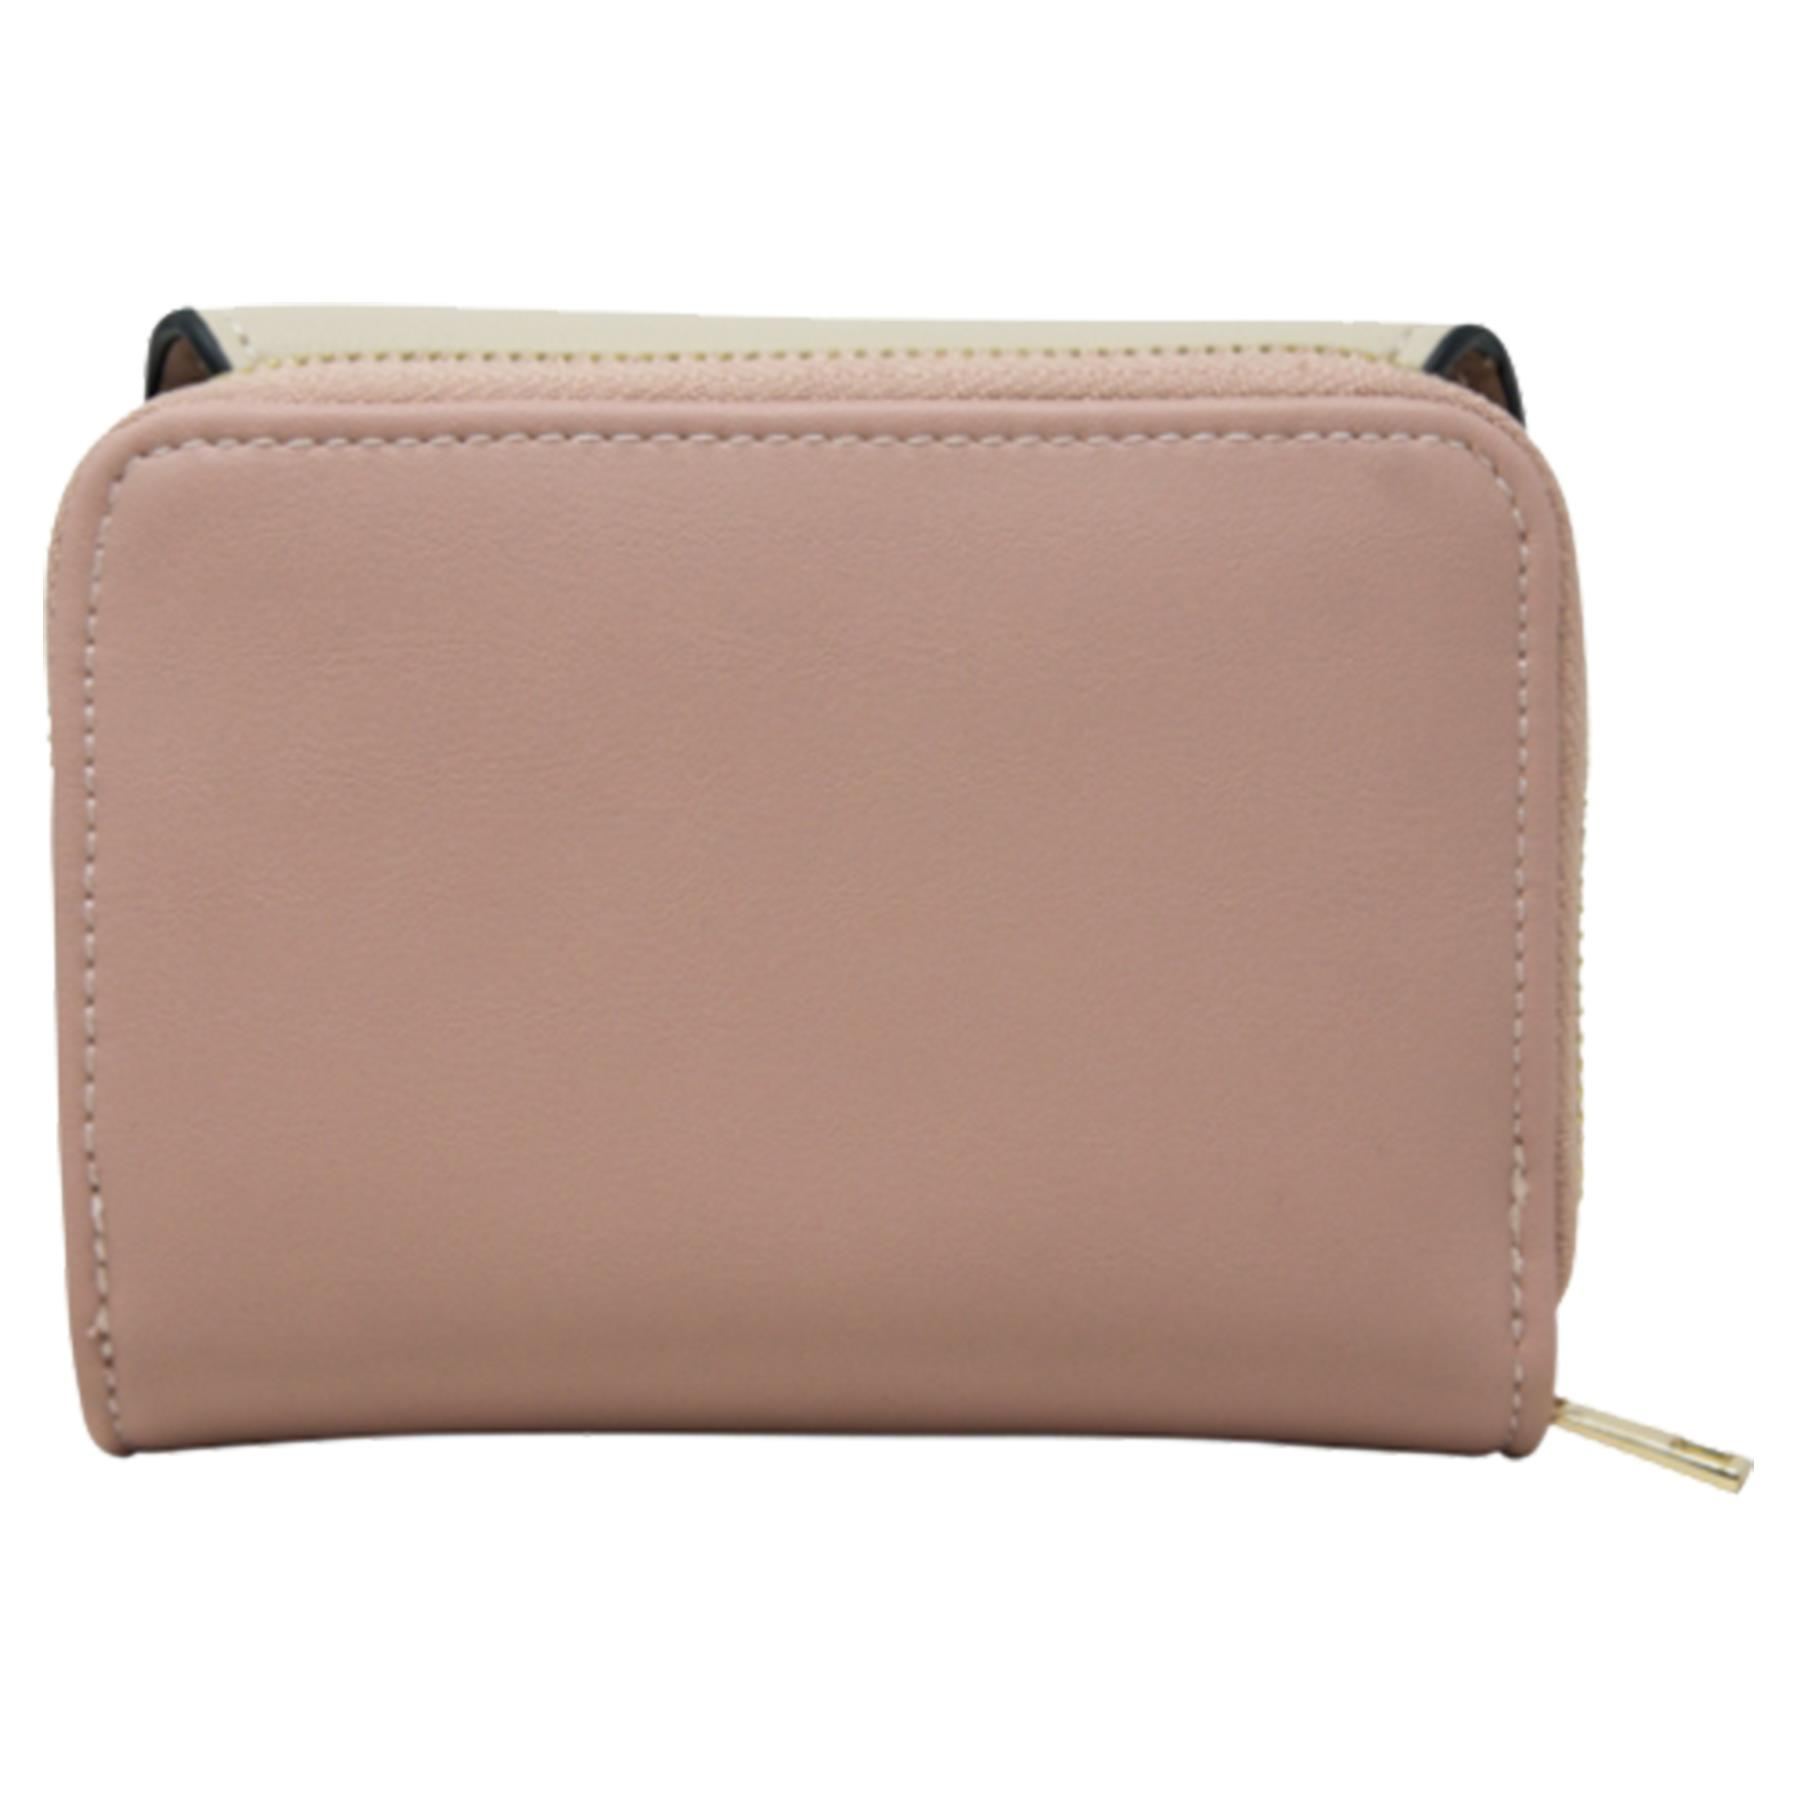 New-Ladies-Multicoloured-Envelope-Faux-Leather-Reptile-Detail-Purse thumbnail 24